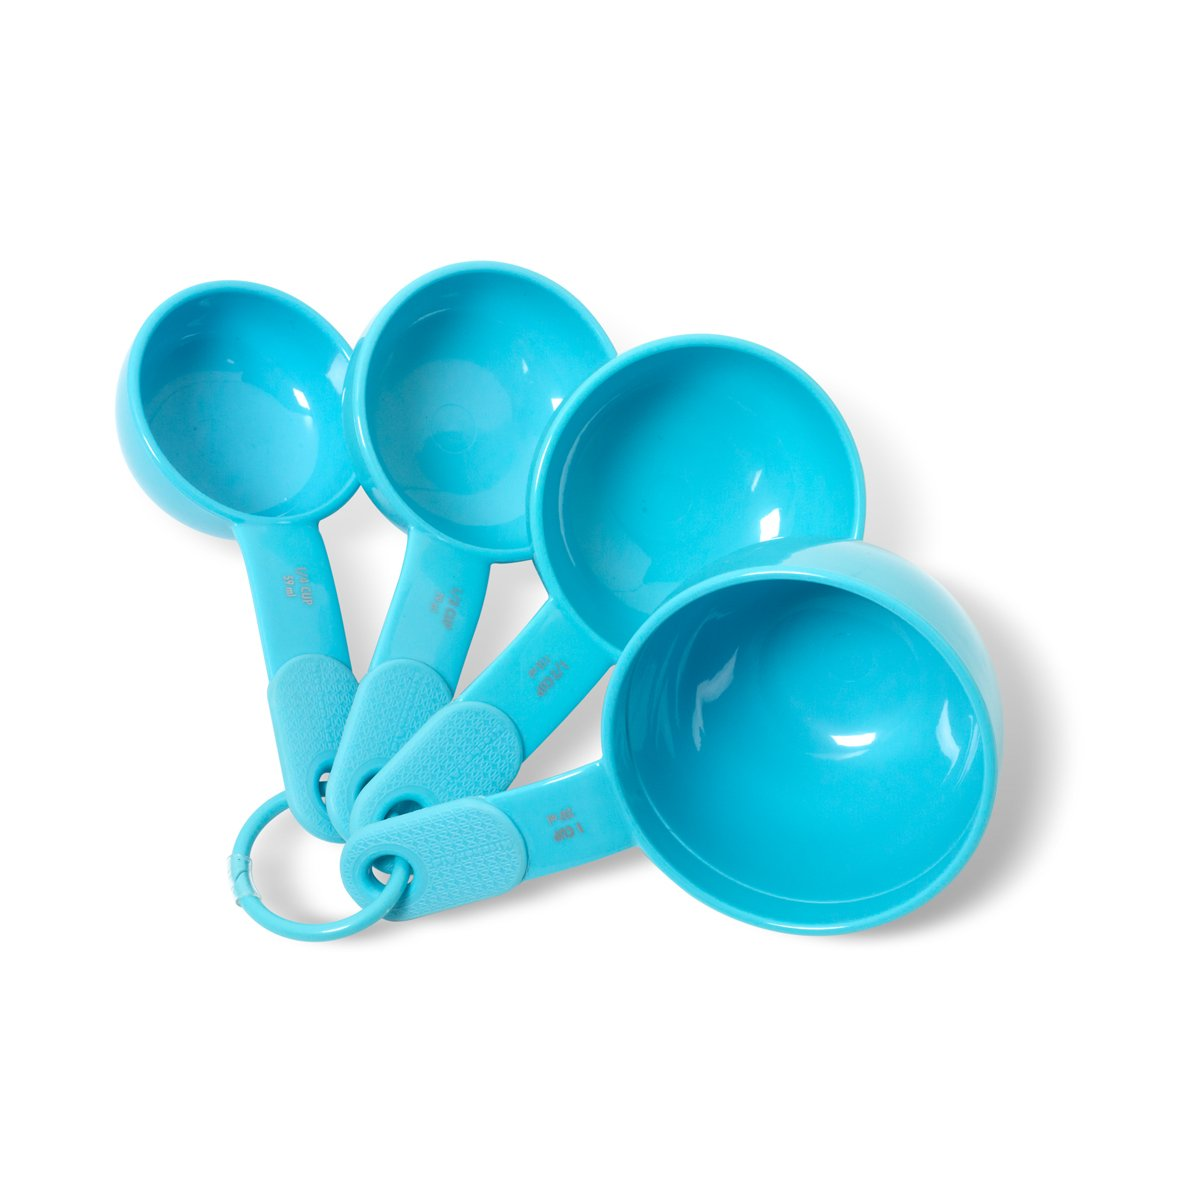 Amazon.com: KitchenAid Classic Plastic Measuring Cups, Turquoise ...